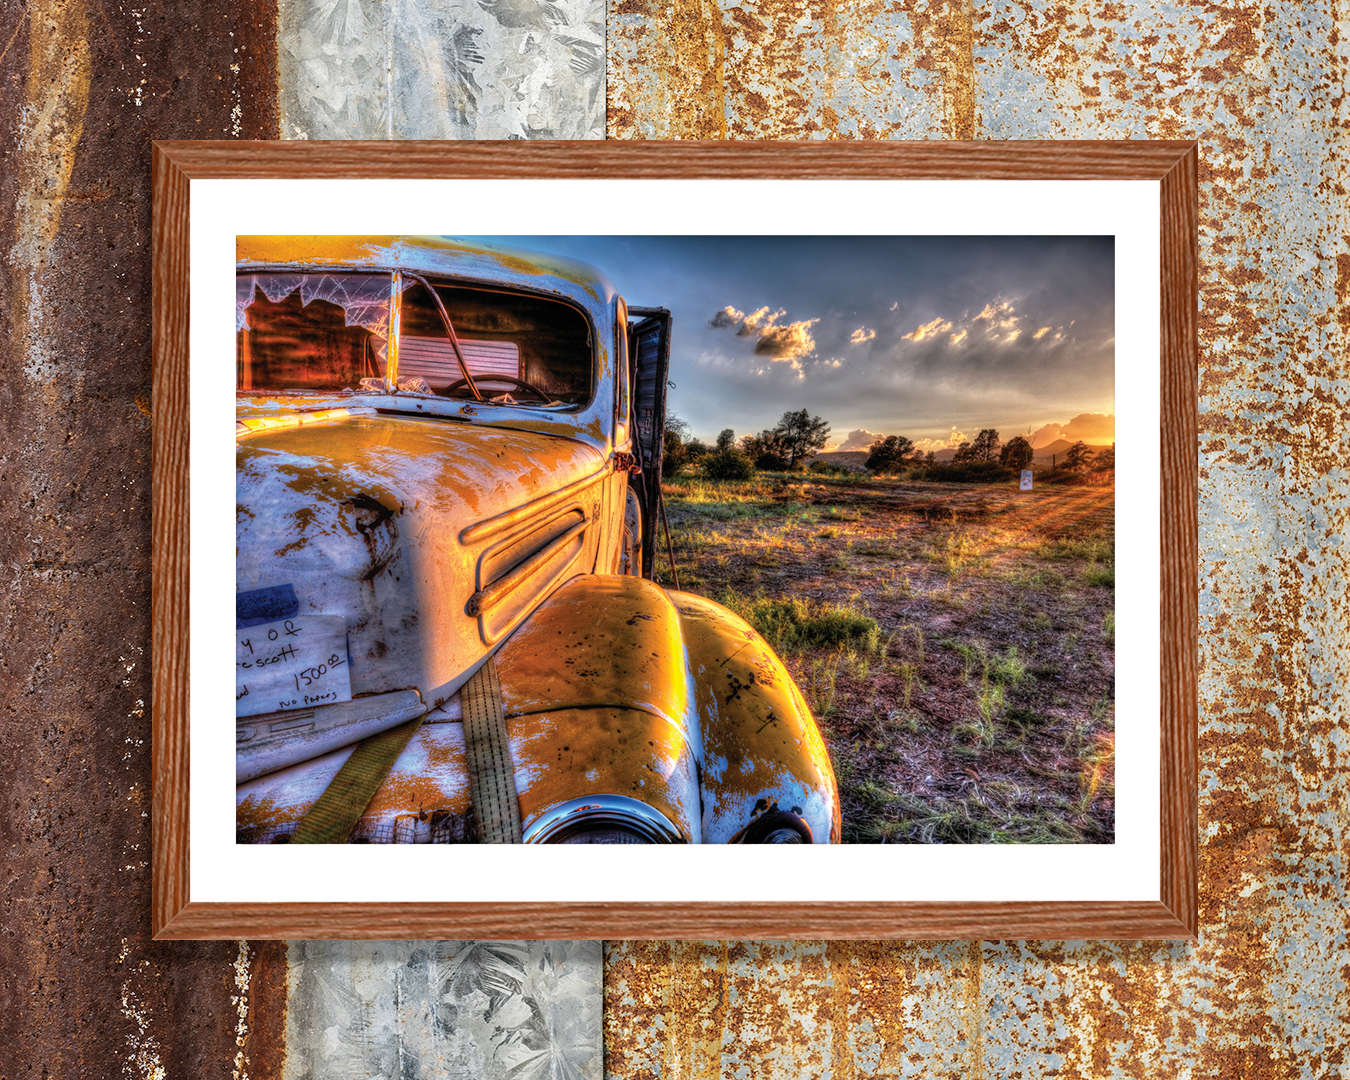 Rusty truck at golden hour by iCanvas artist Bob Larson